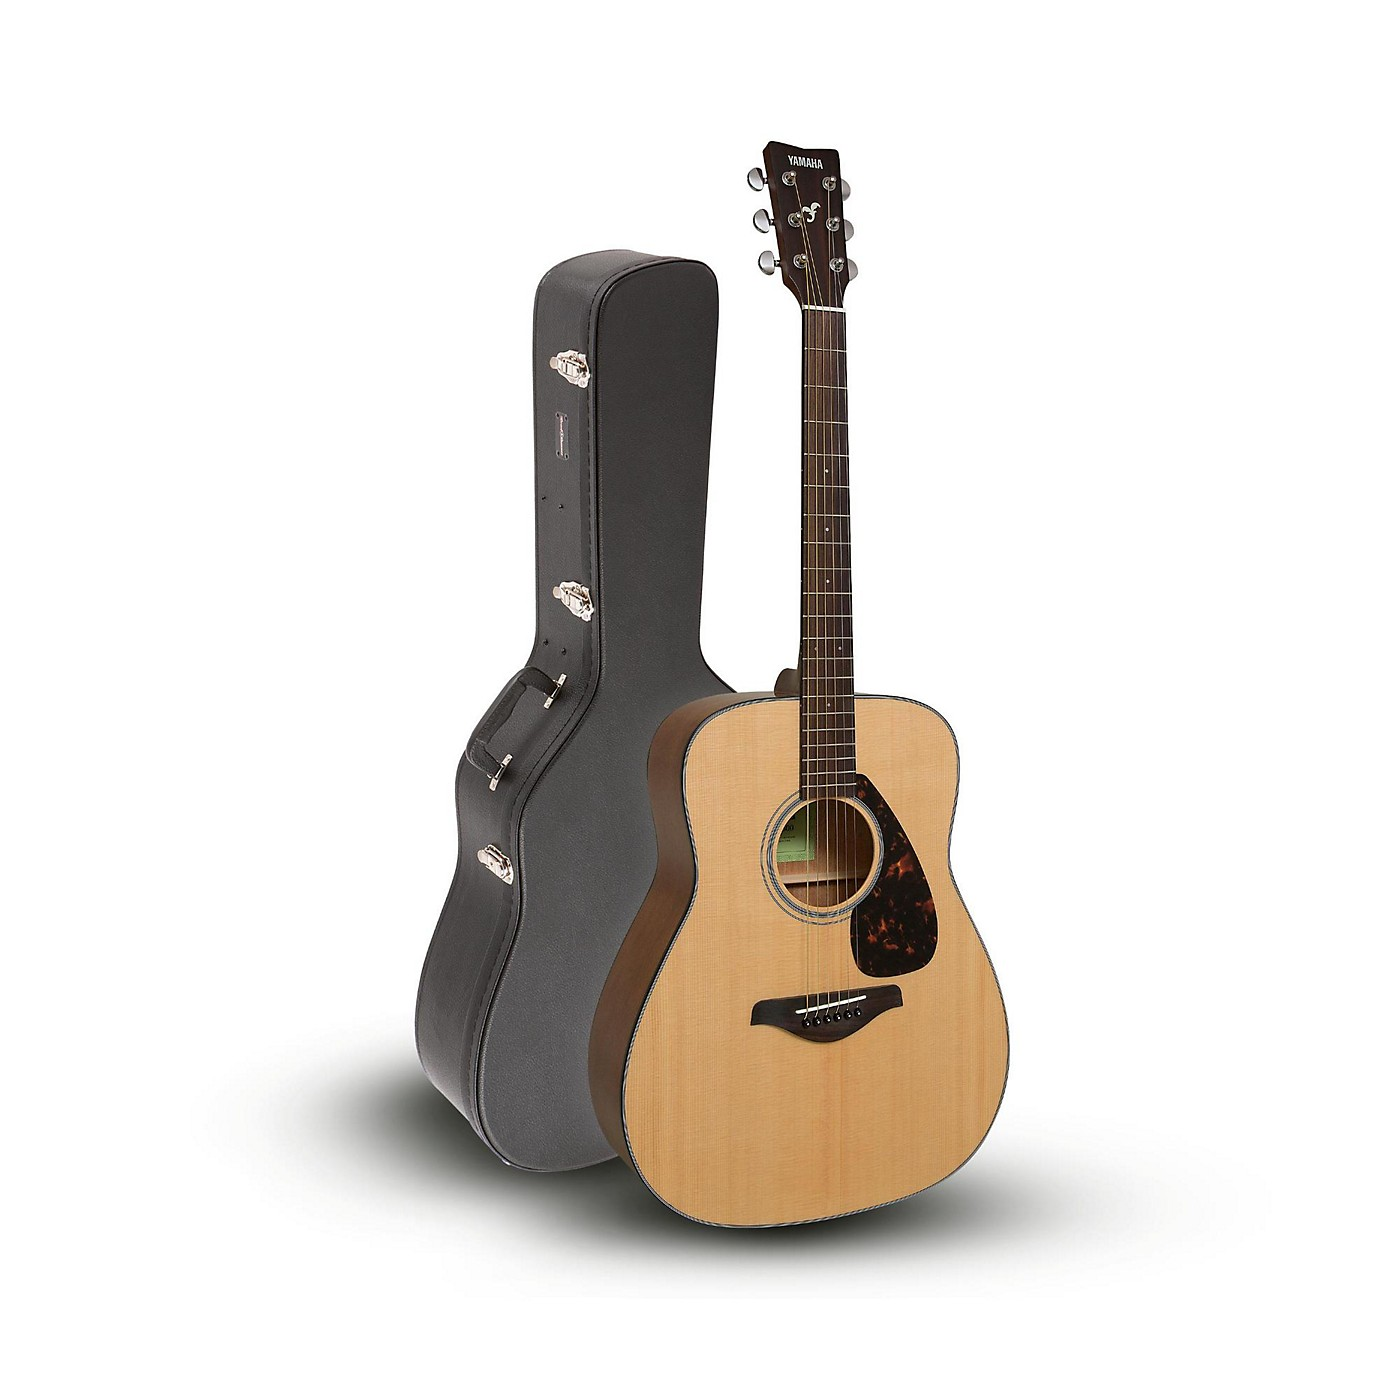 Yamaha FG800 Folk Acoustic Guitar Natural with Road Runner RRDWA  Case thumbnail